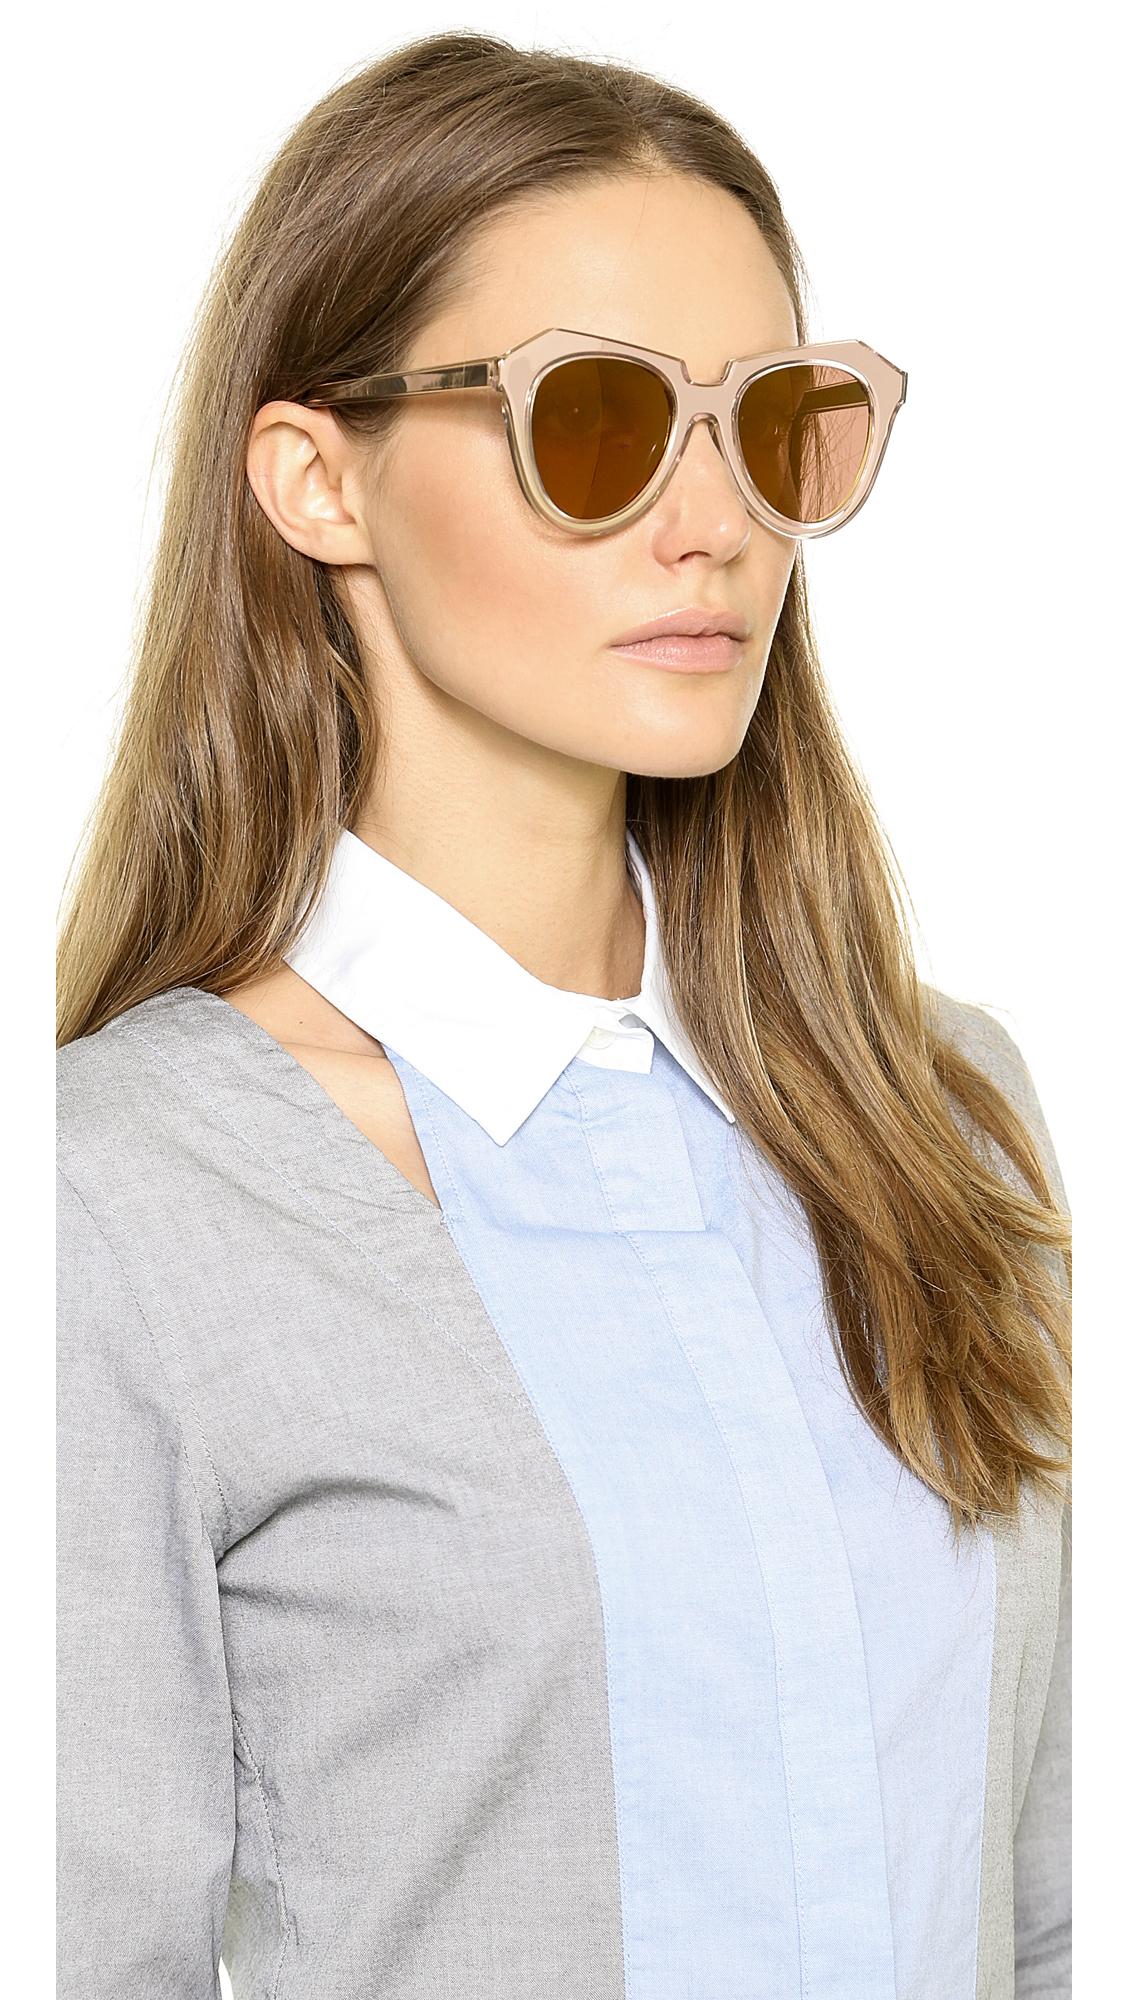 47f87bddbd4 Lyst - Karen Walker Number One Mirrored Sunglasses - Gold Gold Flash ...